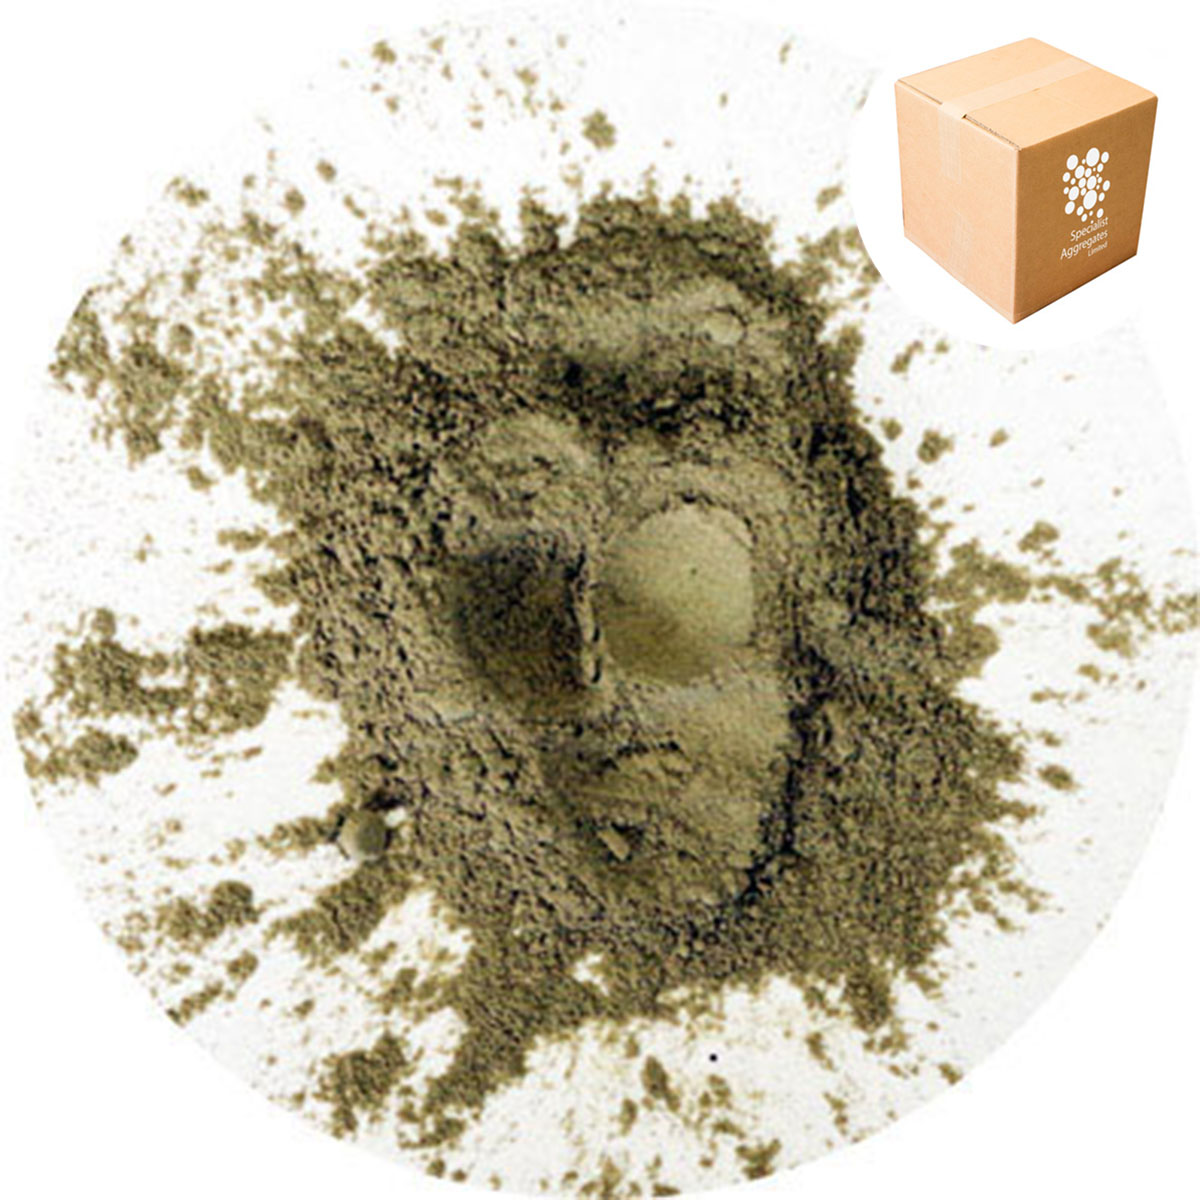 Buy Bentonite Clay - Dusting Powder - Brown | Specialist